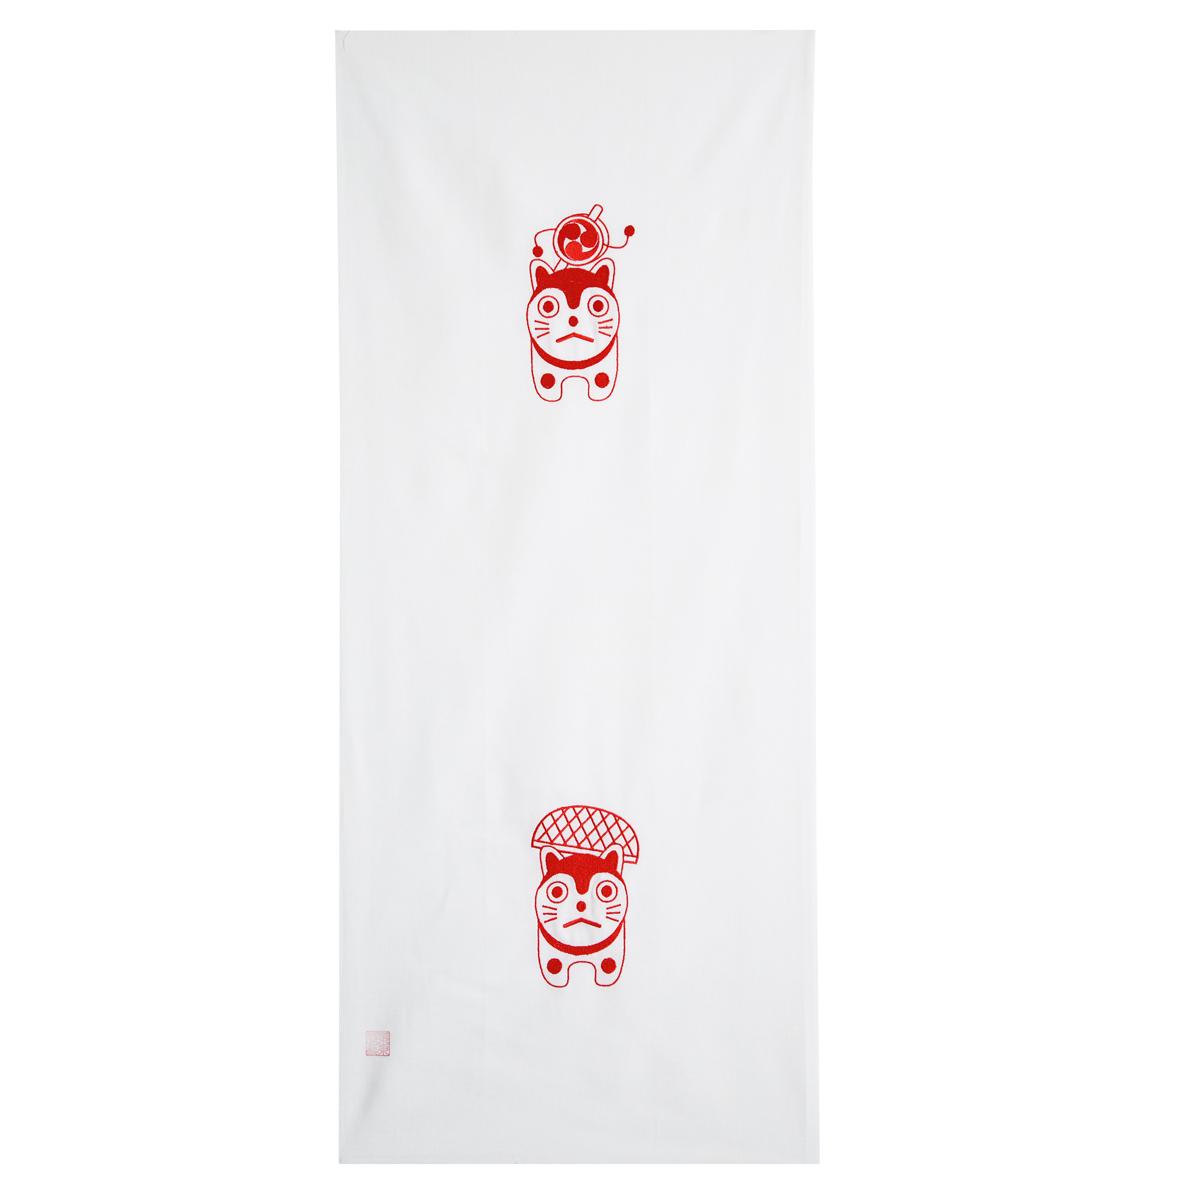 KY01-34W/手ぬぐい/こま犬〈白〉